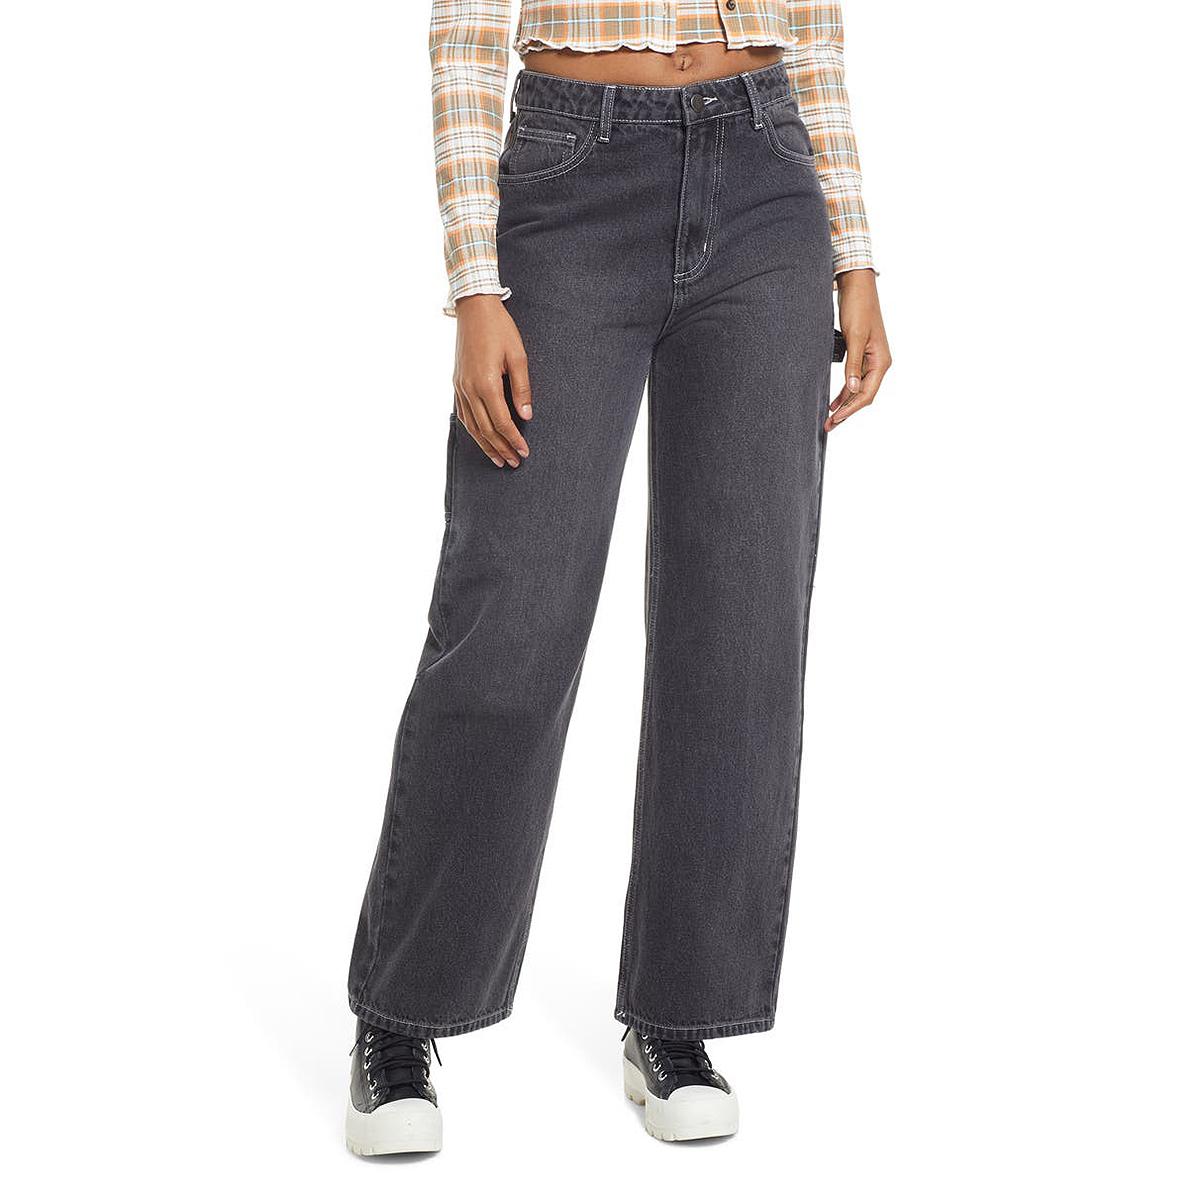 nordstrom-anniversary-sale-zara-style-bp-wide-leg-jeans